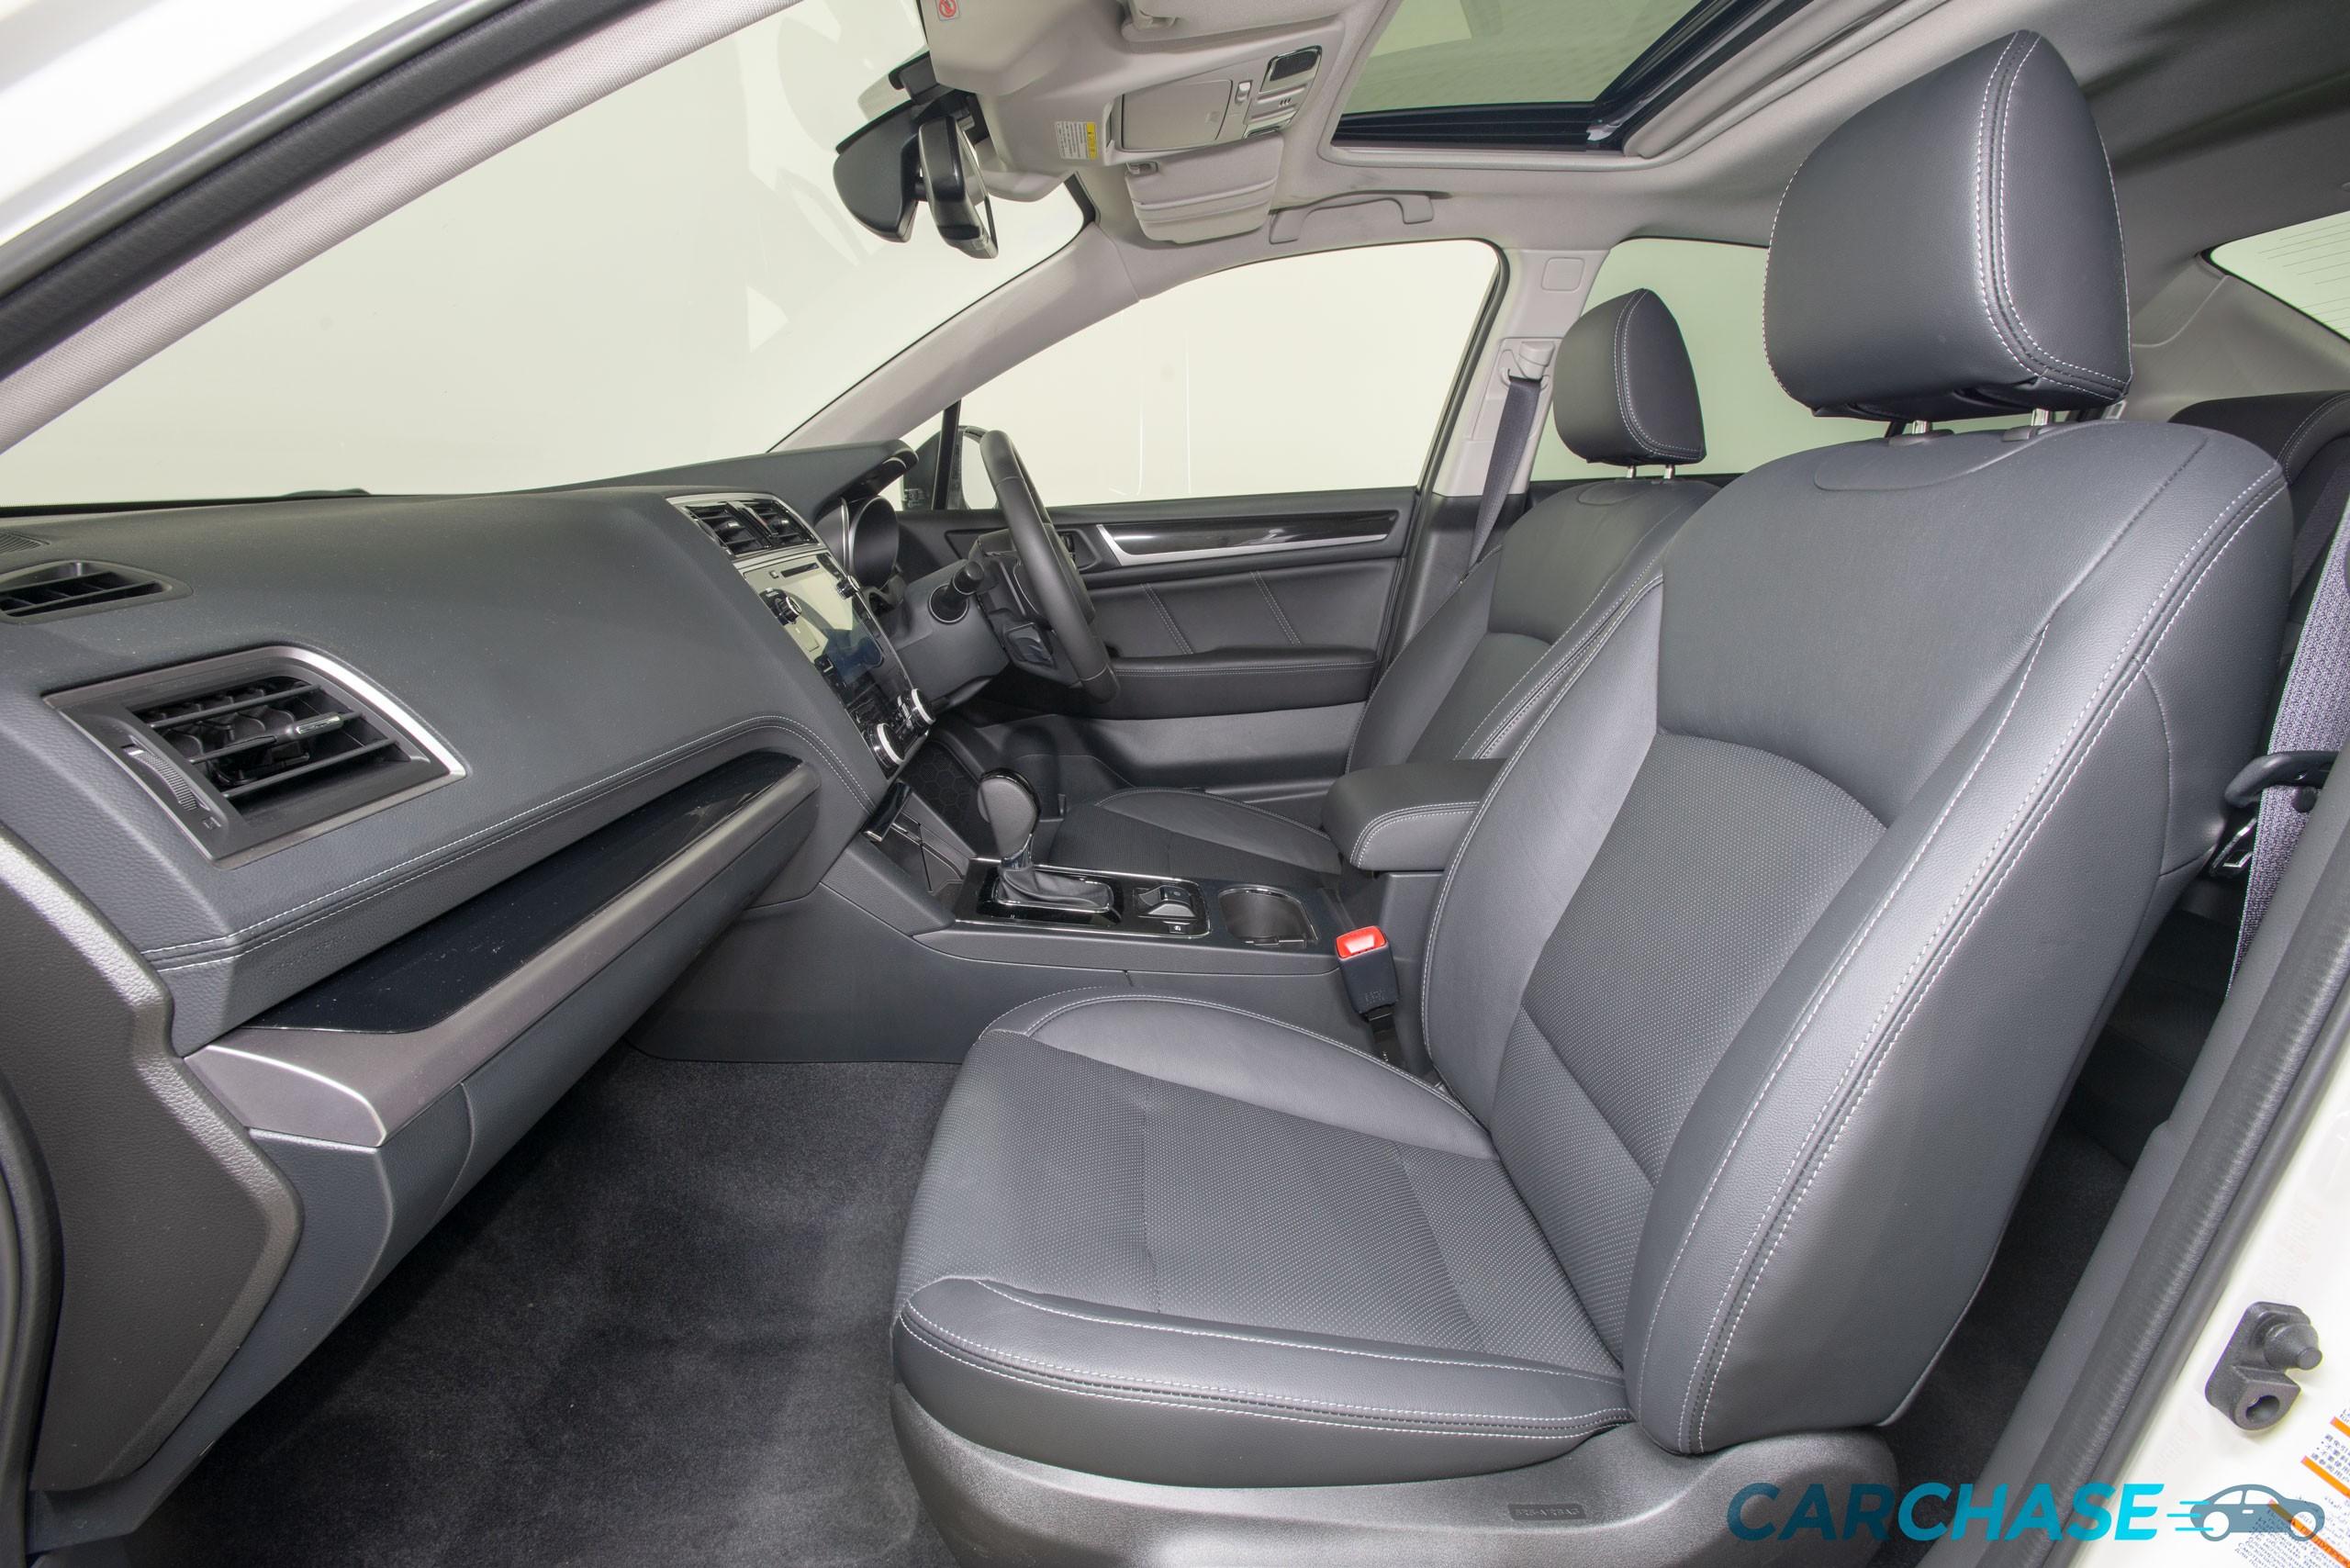 Image of passenger front profile of 2018 Subaru Liberty 2.5i Premium